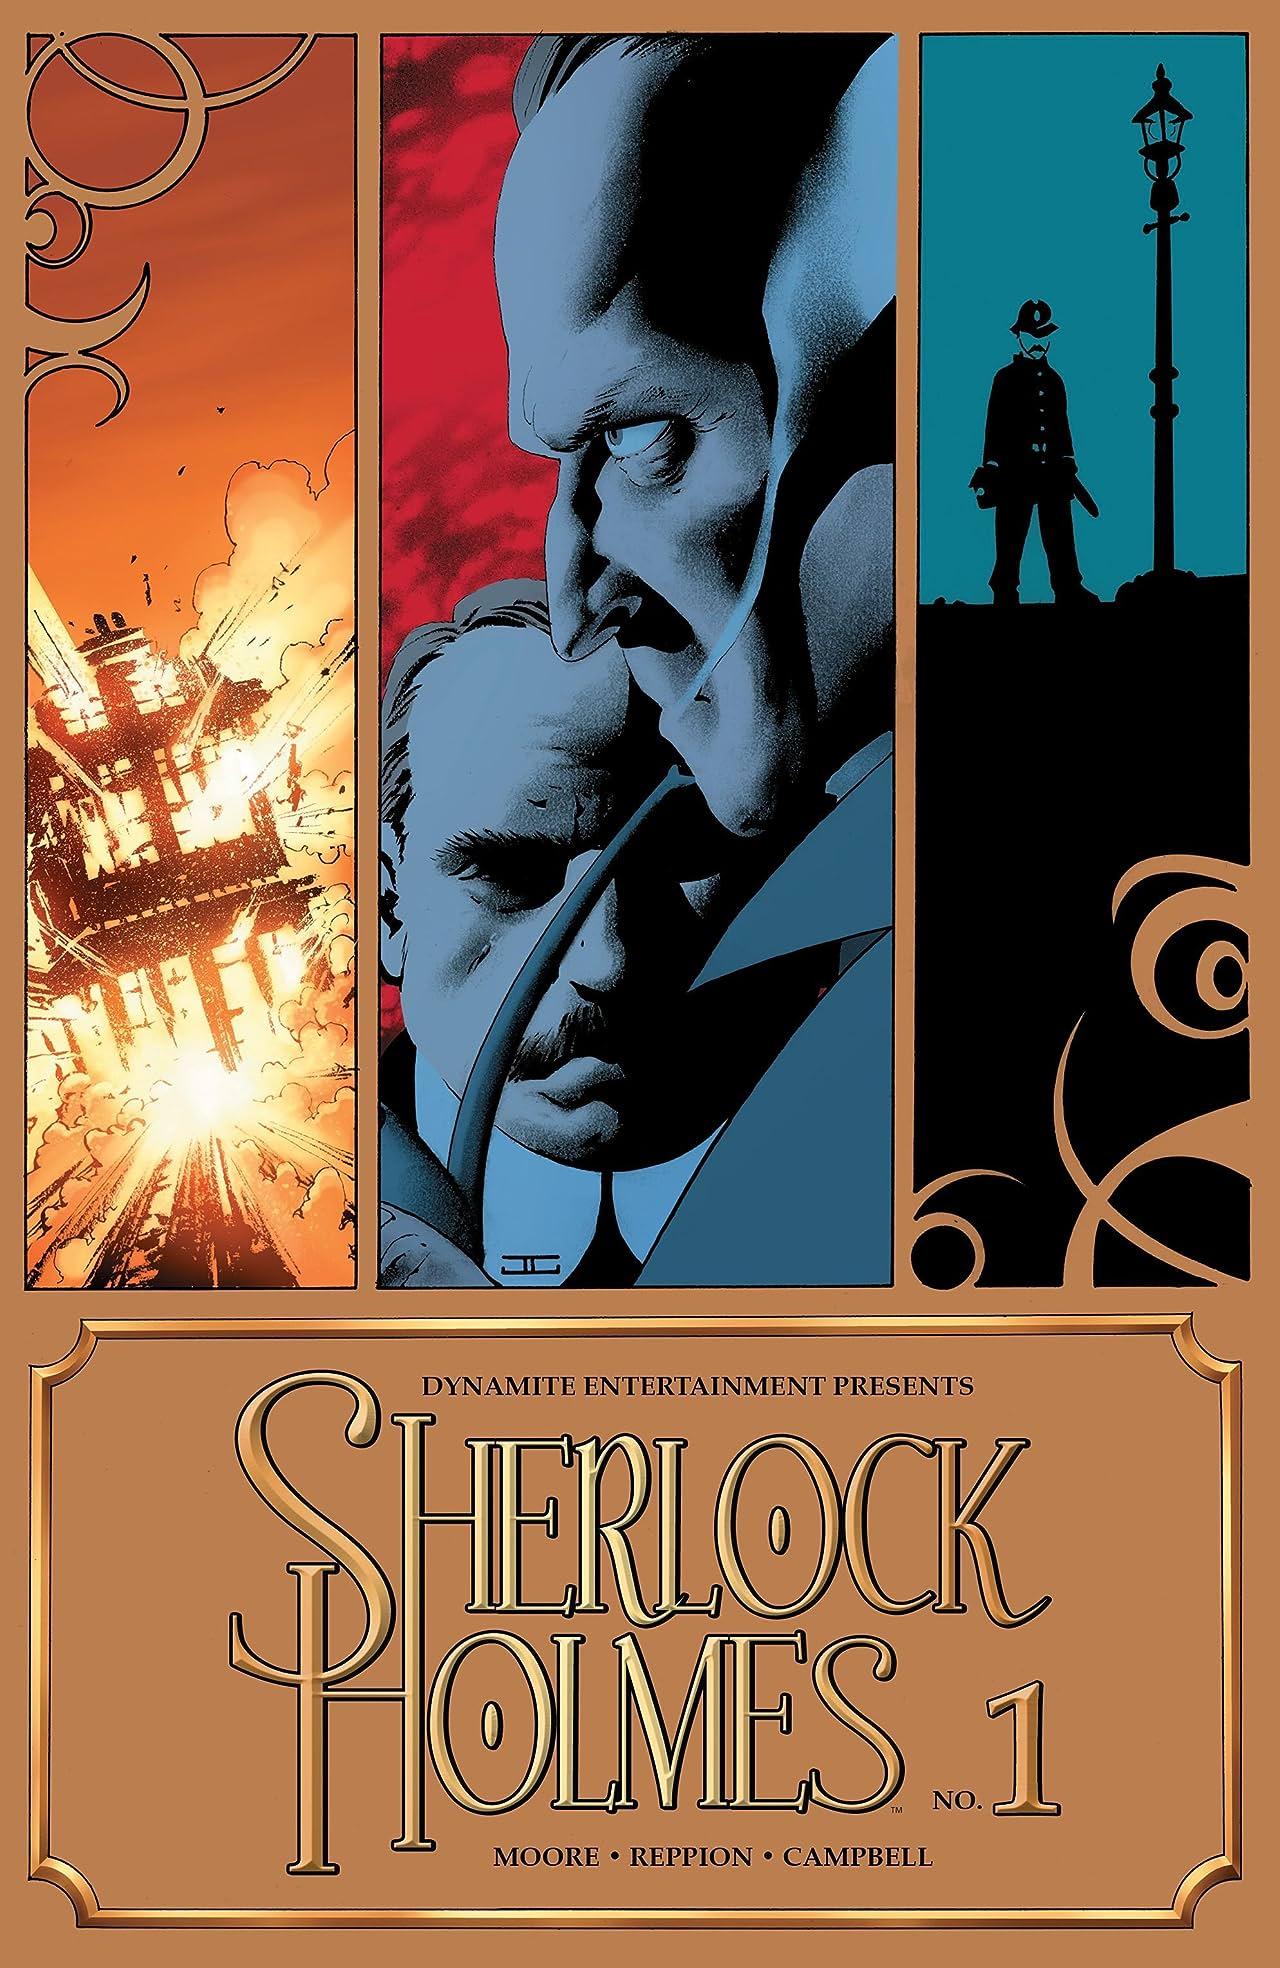 Sherlock Holmes #1 (of 5)